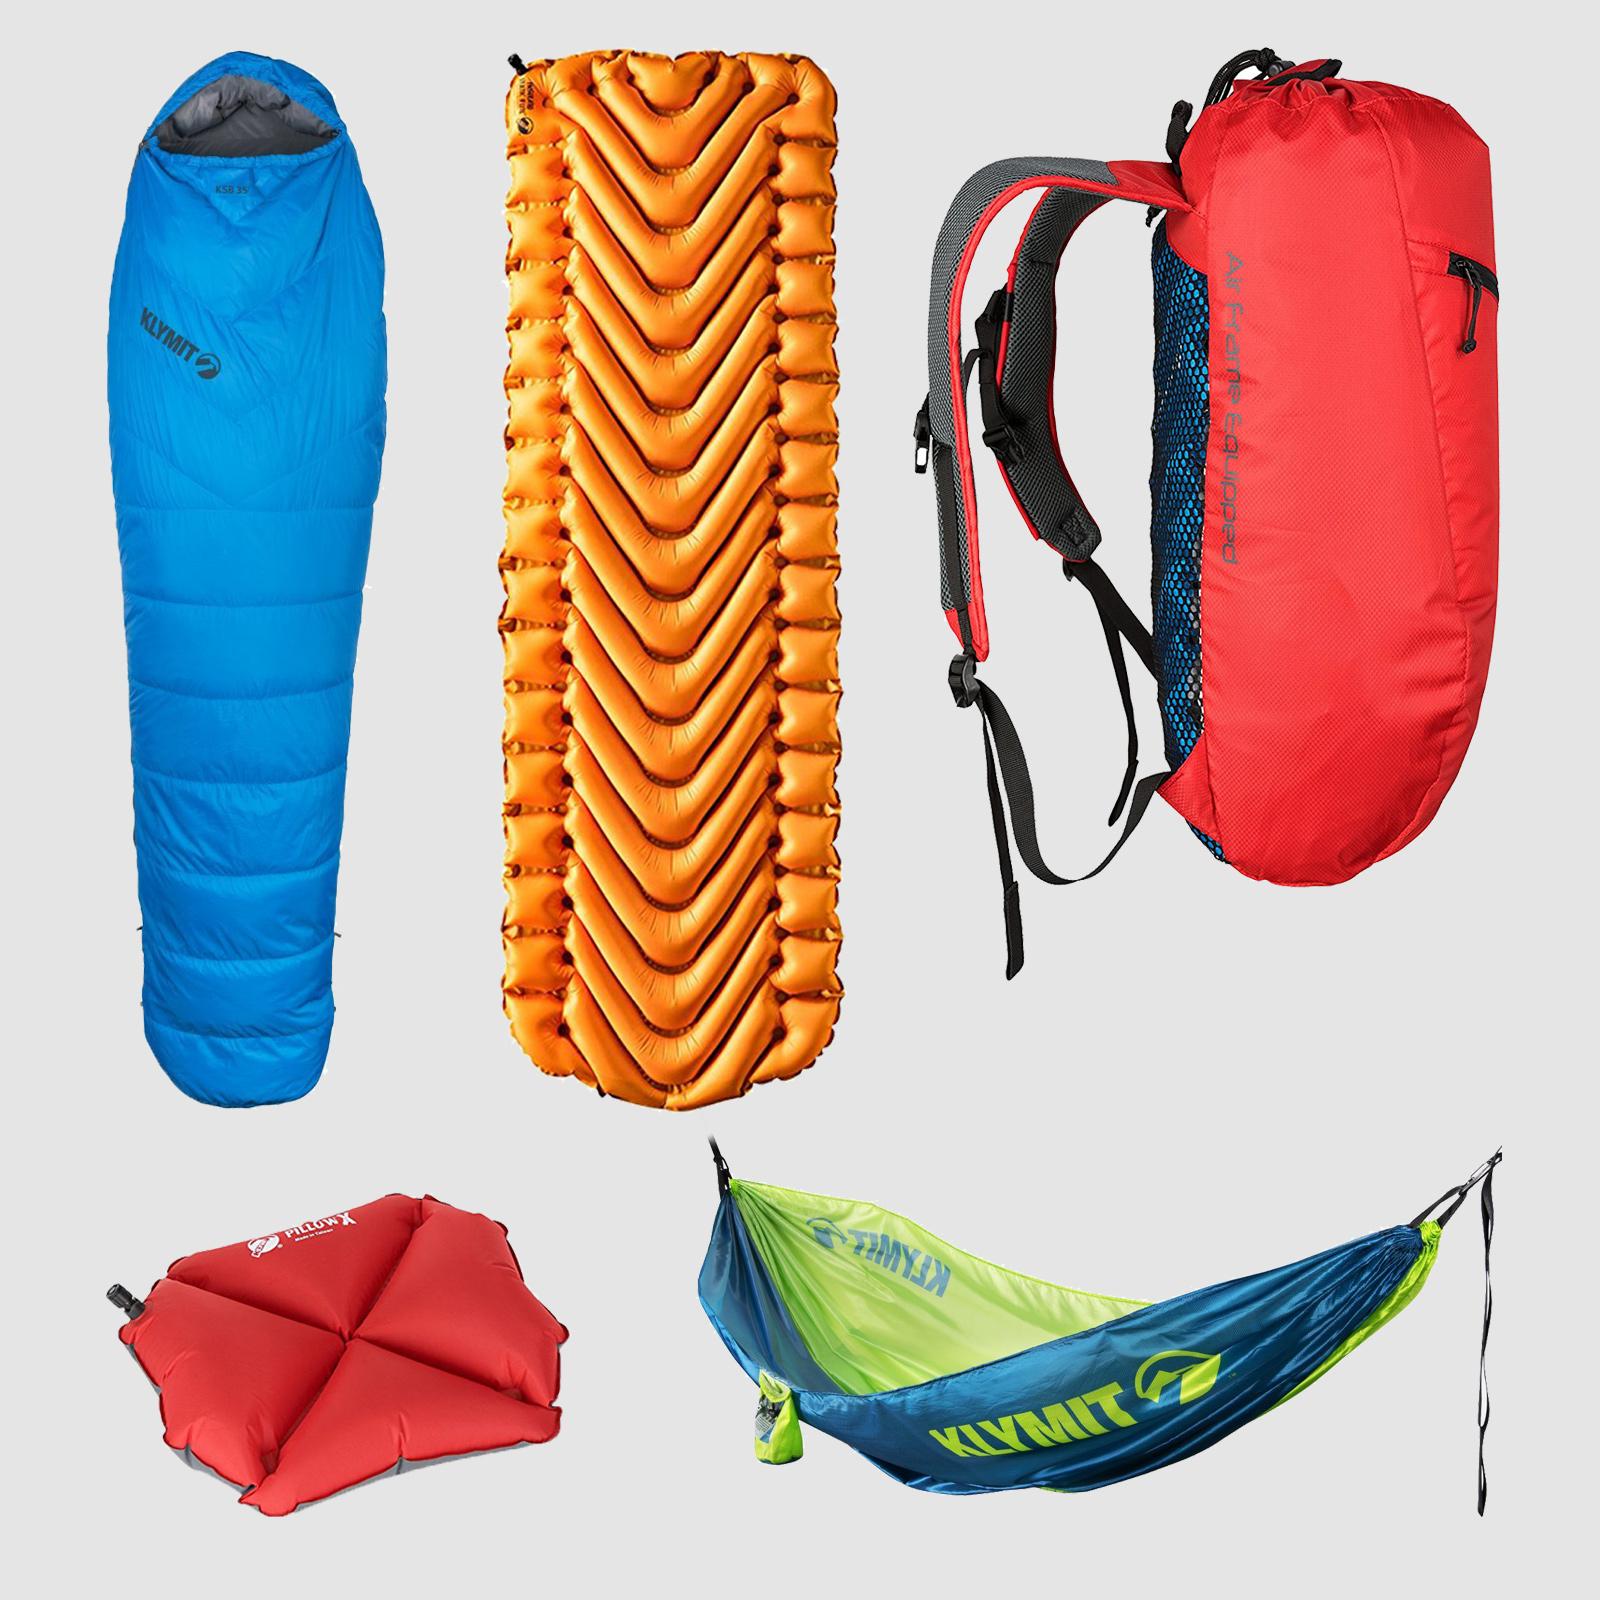 Klymit Camping Gear | $14-$300 | Amazon